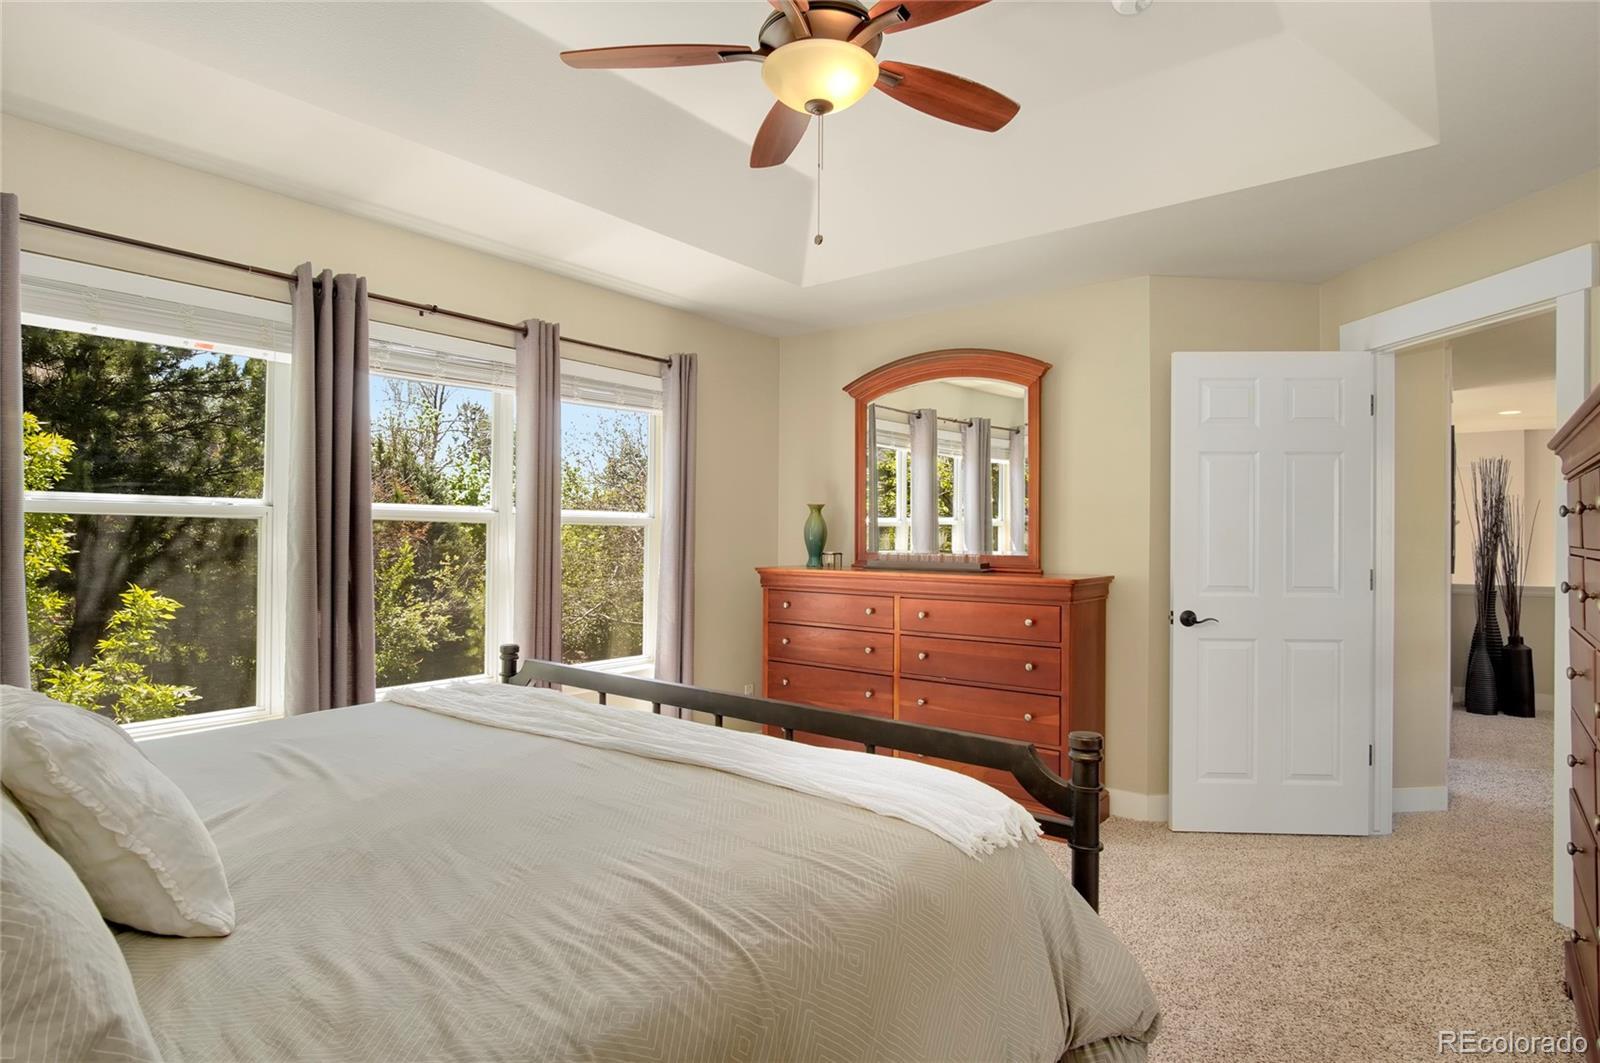 MLS# 7483378 - 24 - 10022 Hughes Way, Highlands Ranch, CO 80126